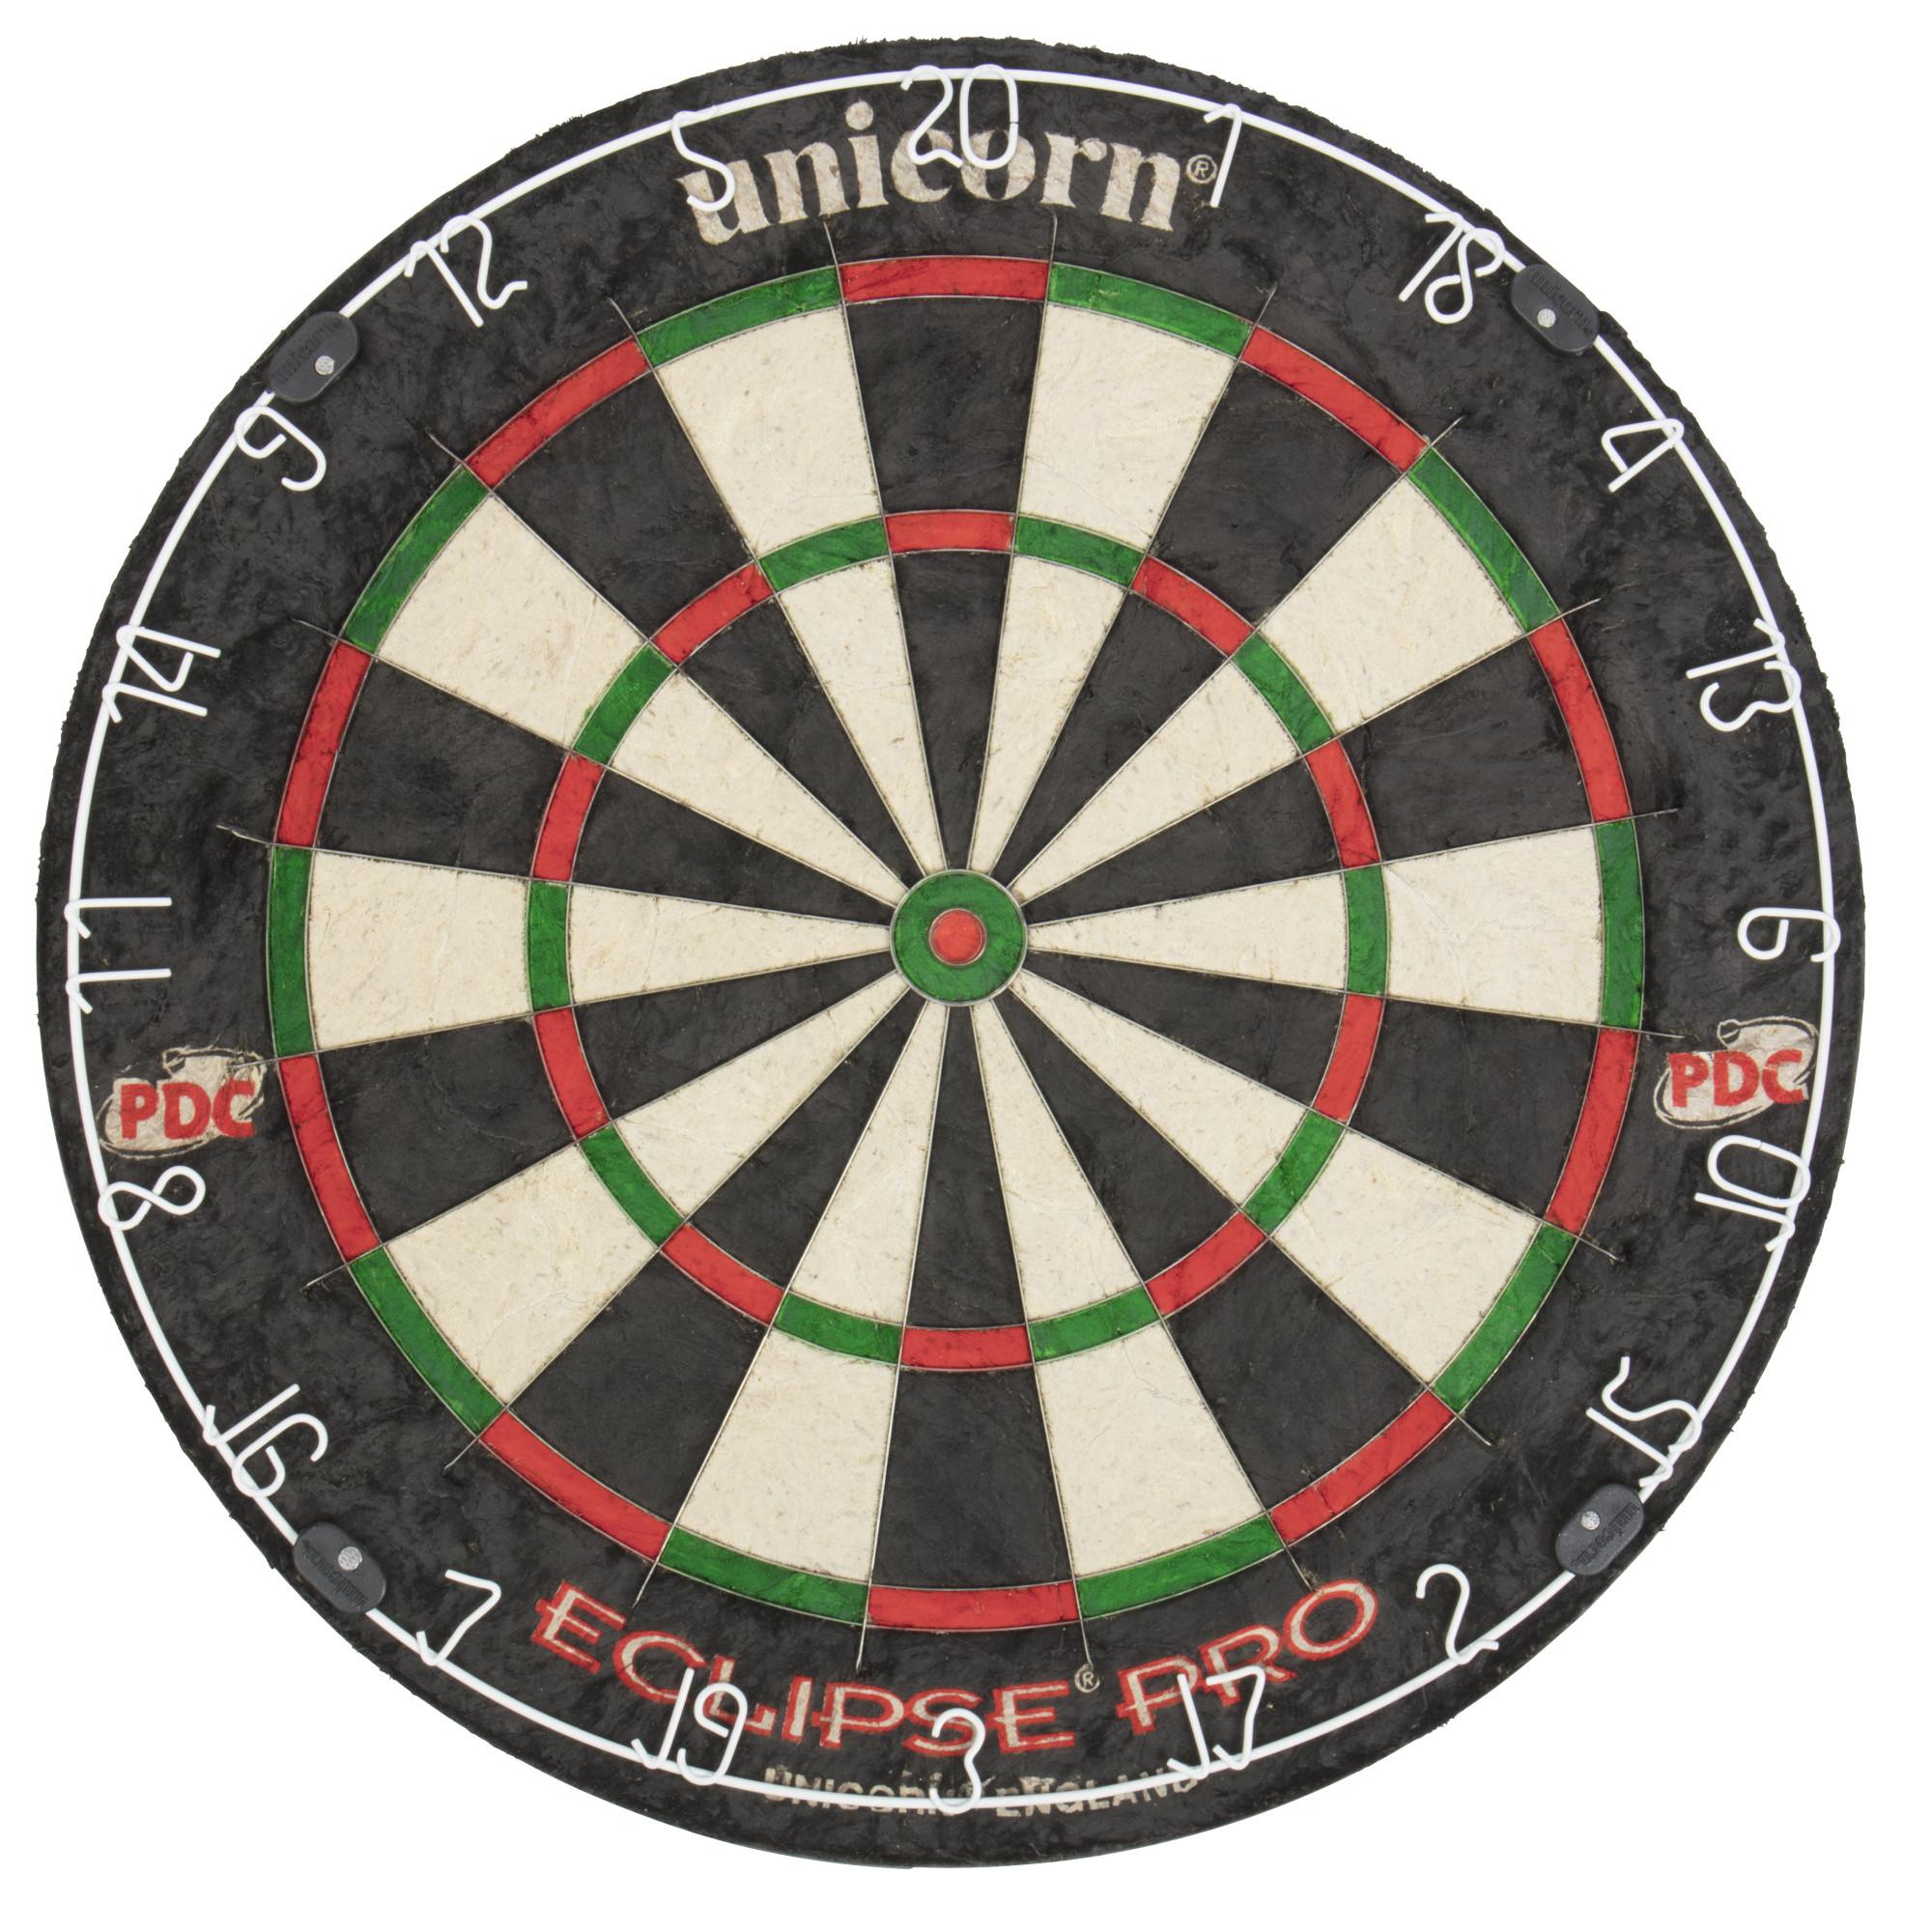 Unicorn Eclipse Pro Dart Board with Ultra slim Segmentation – 30% Thinner Than Conventional Boards